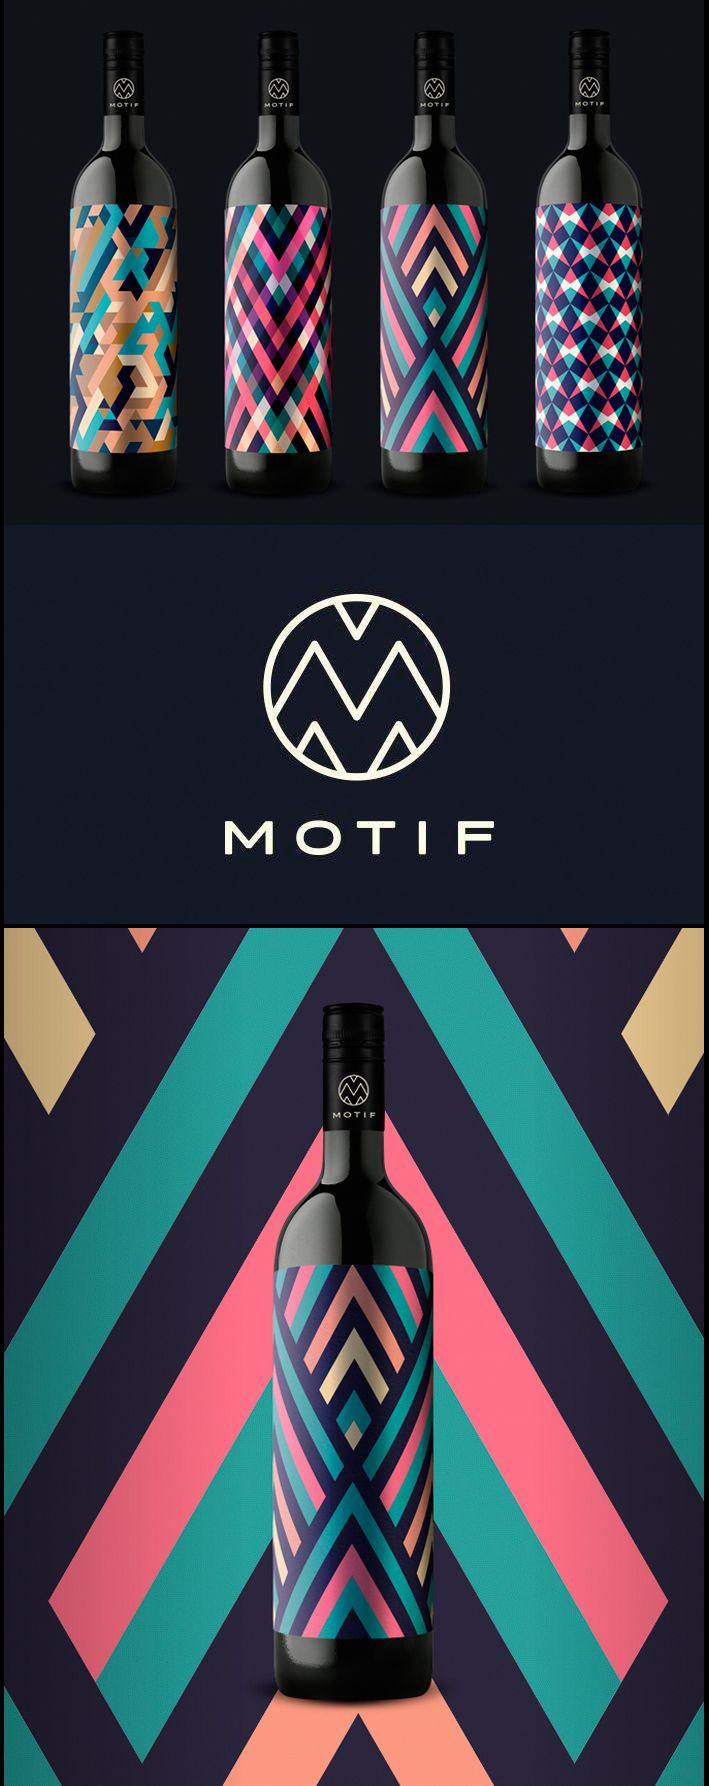 Motif Wine. - #packaging #labelling #design - Isadora Design, a Creative Web Design Agency http://www.IsadoraDesign.com/